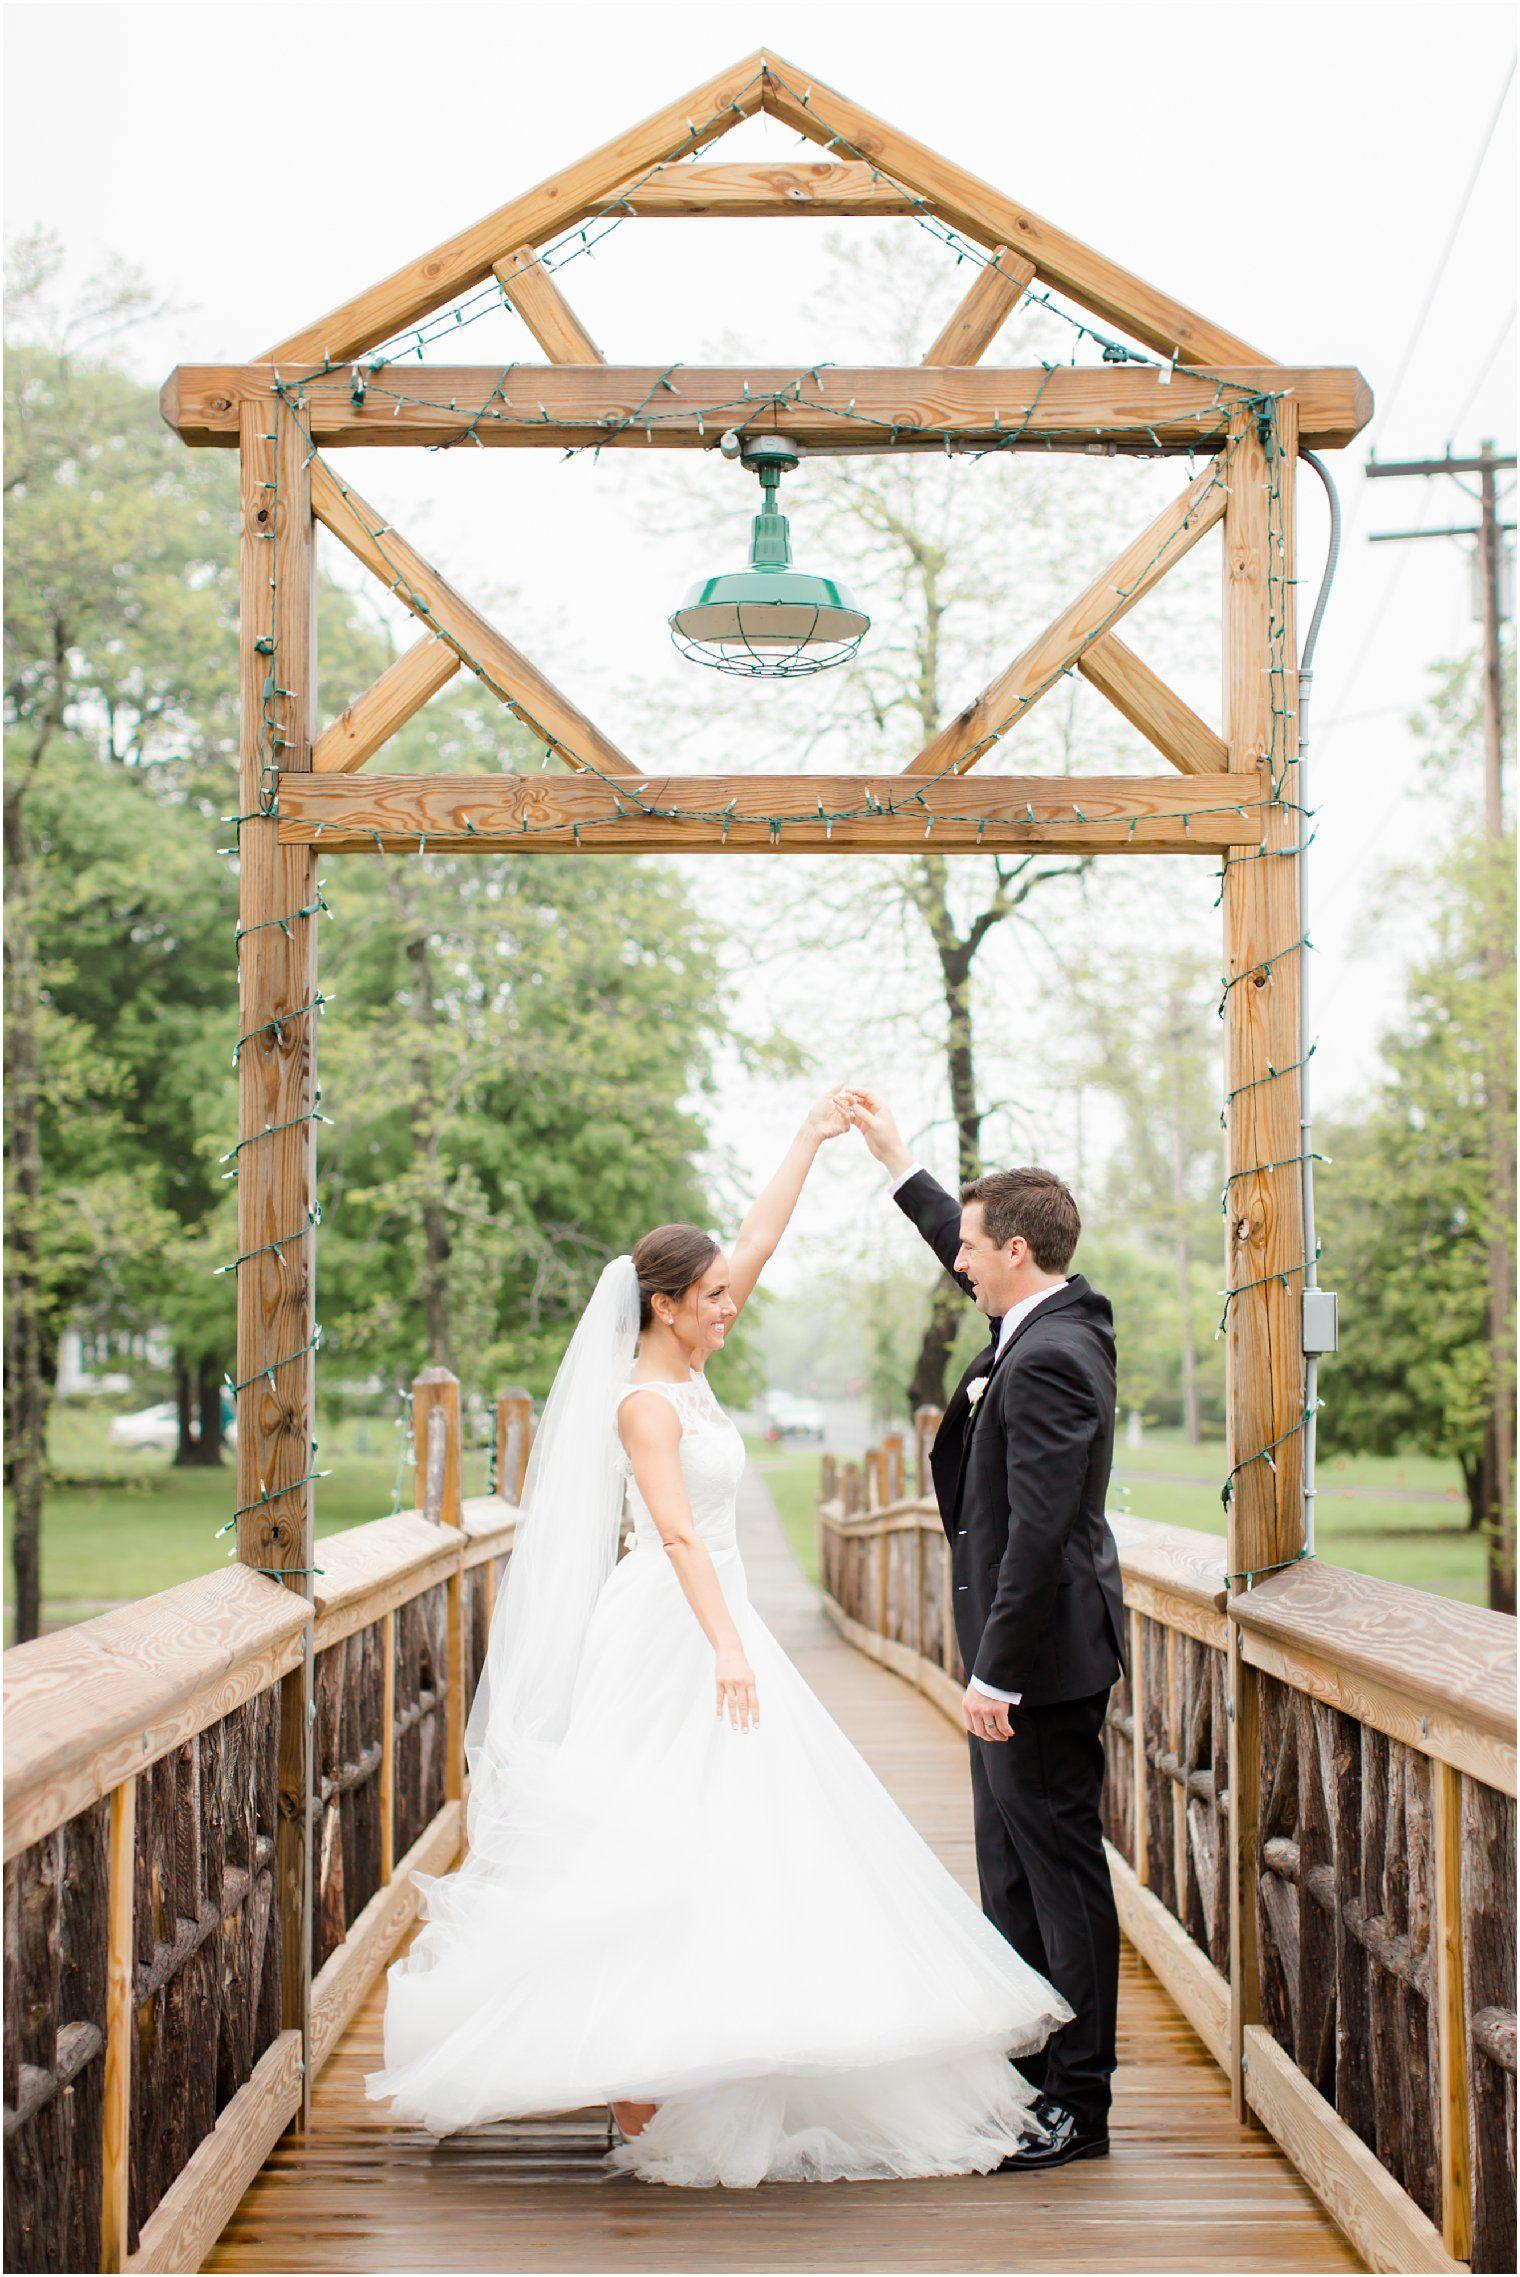 Bride And Groom Dancing On Spring Lake Bridge See More Of This Clic Wedding Here Golf Club Northern Nj Venue